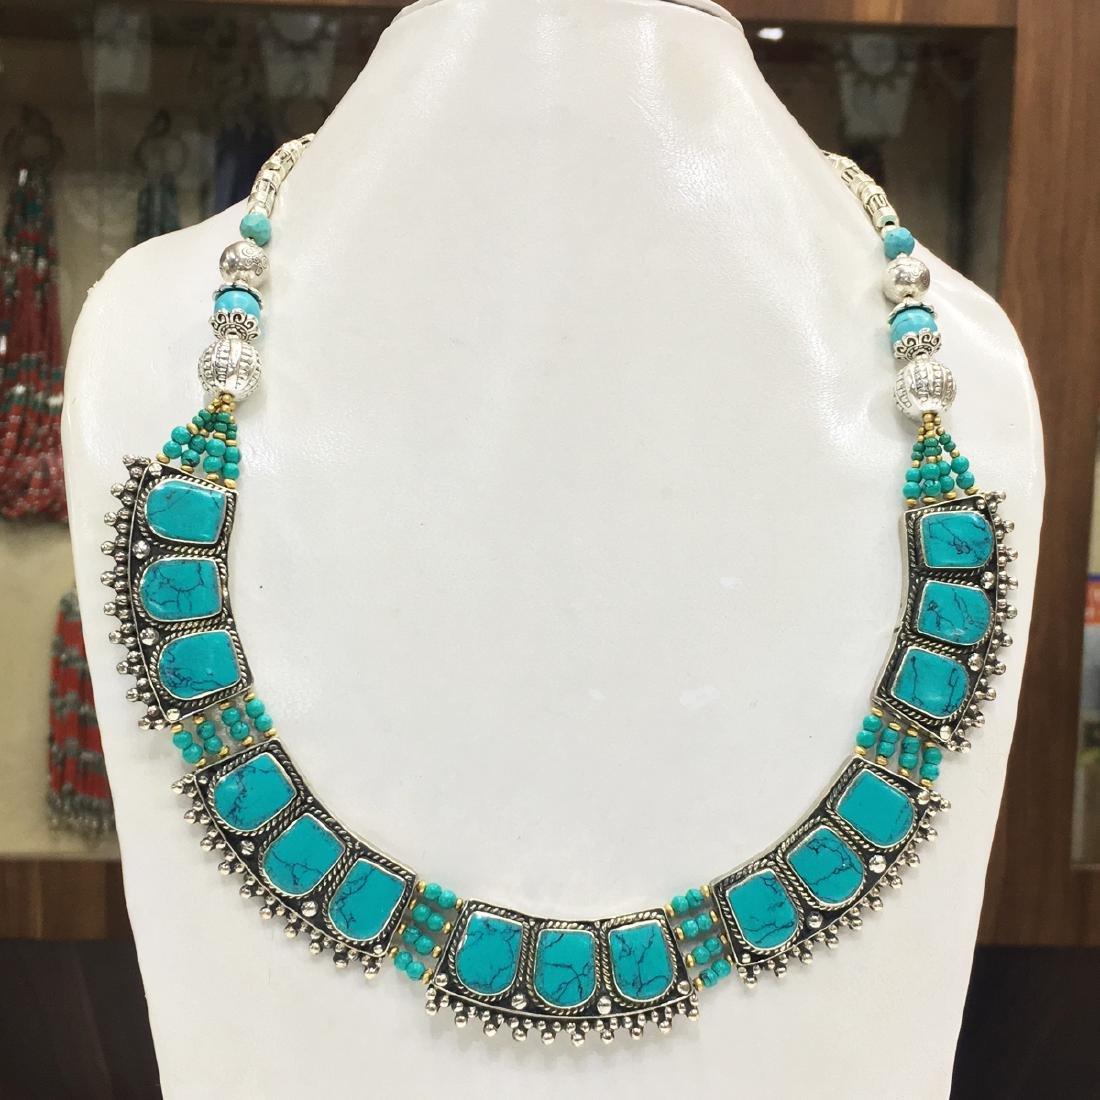 Women's Old Vintage Turquoise Tibetan Asian Necklace